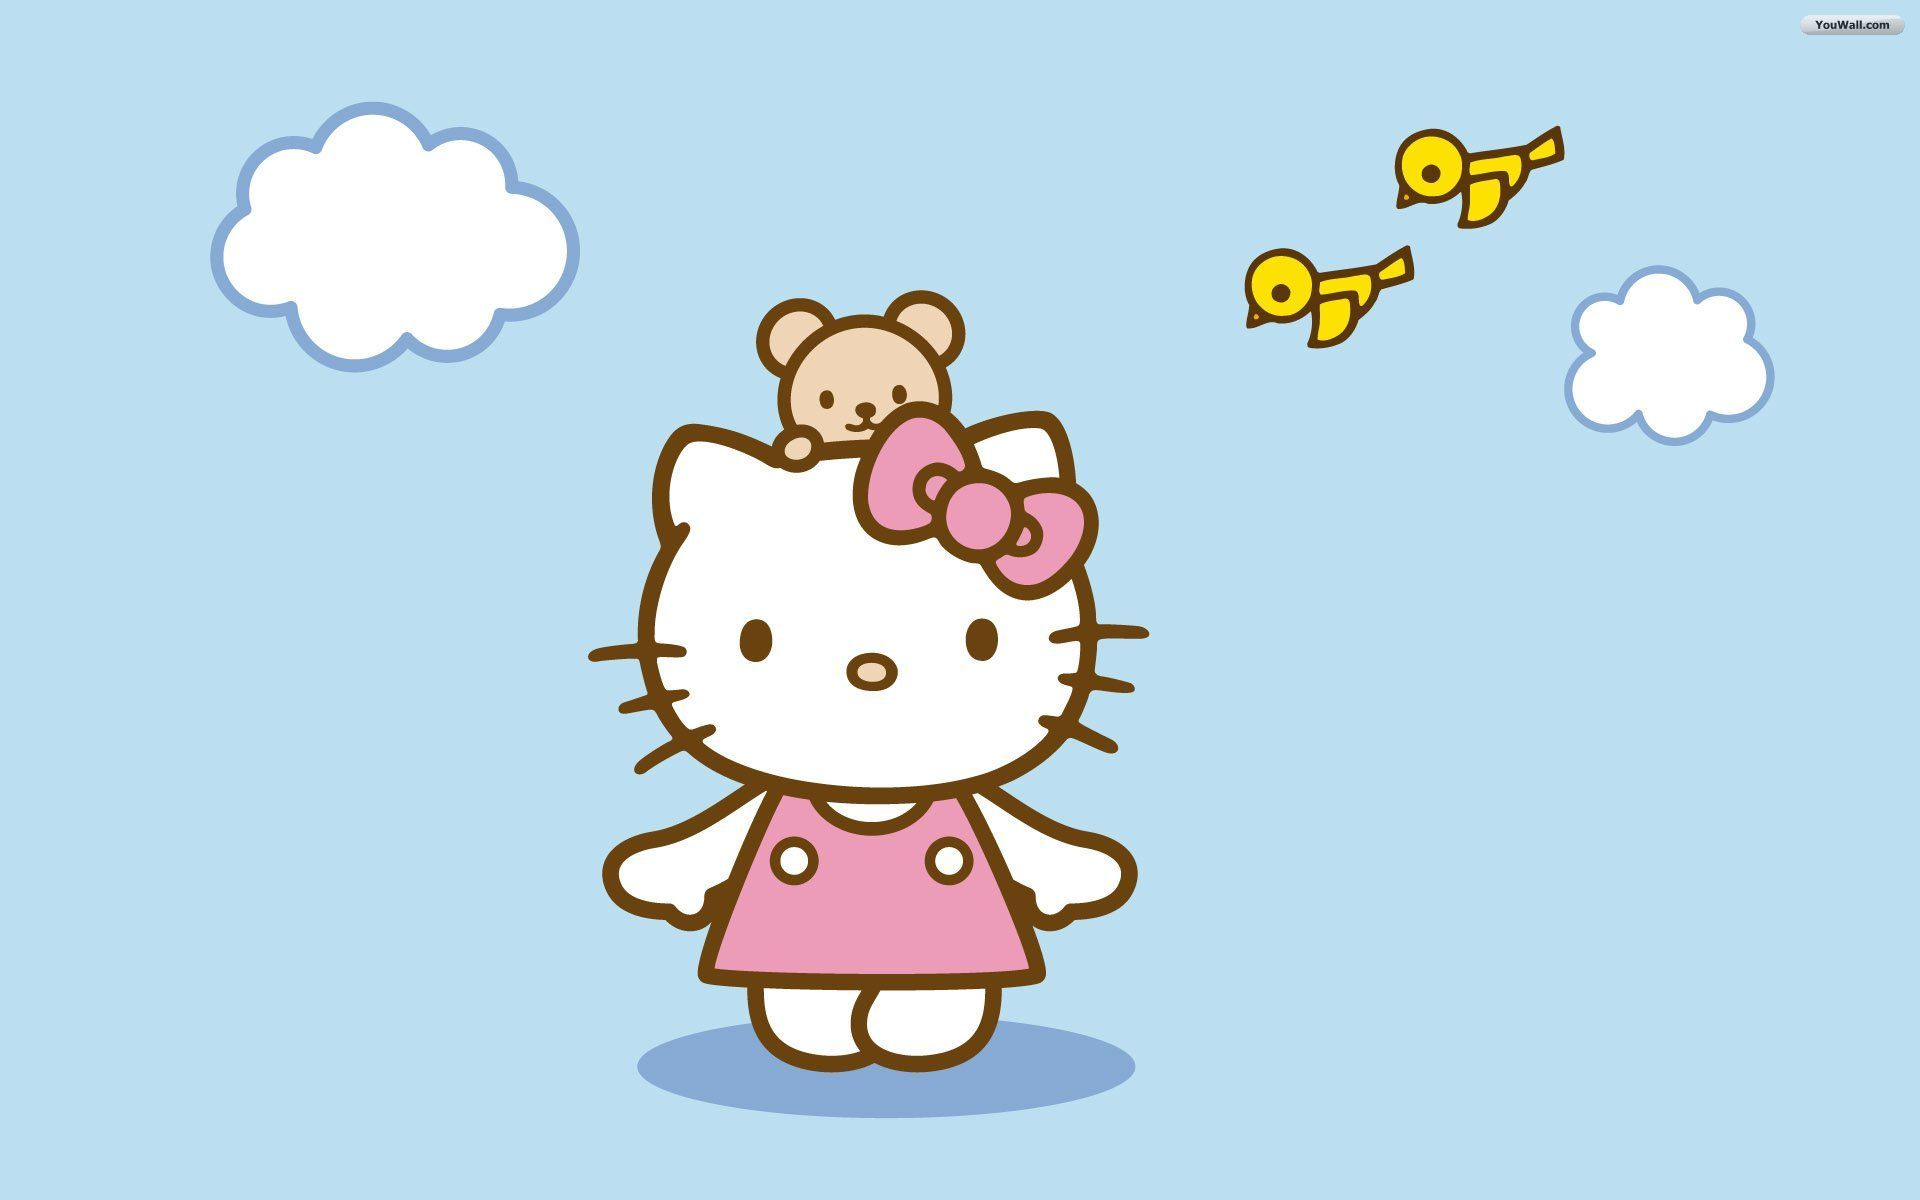 Cool Wallpaper Hello Kitty Desktop Background - 152cc8d620a02a1e51536f6d81291d88  Pictures_23842.jpg